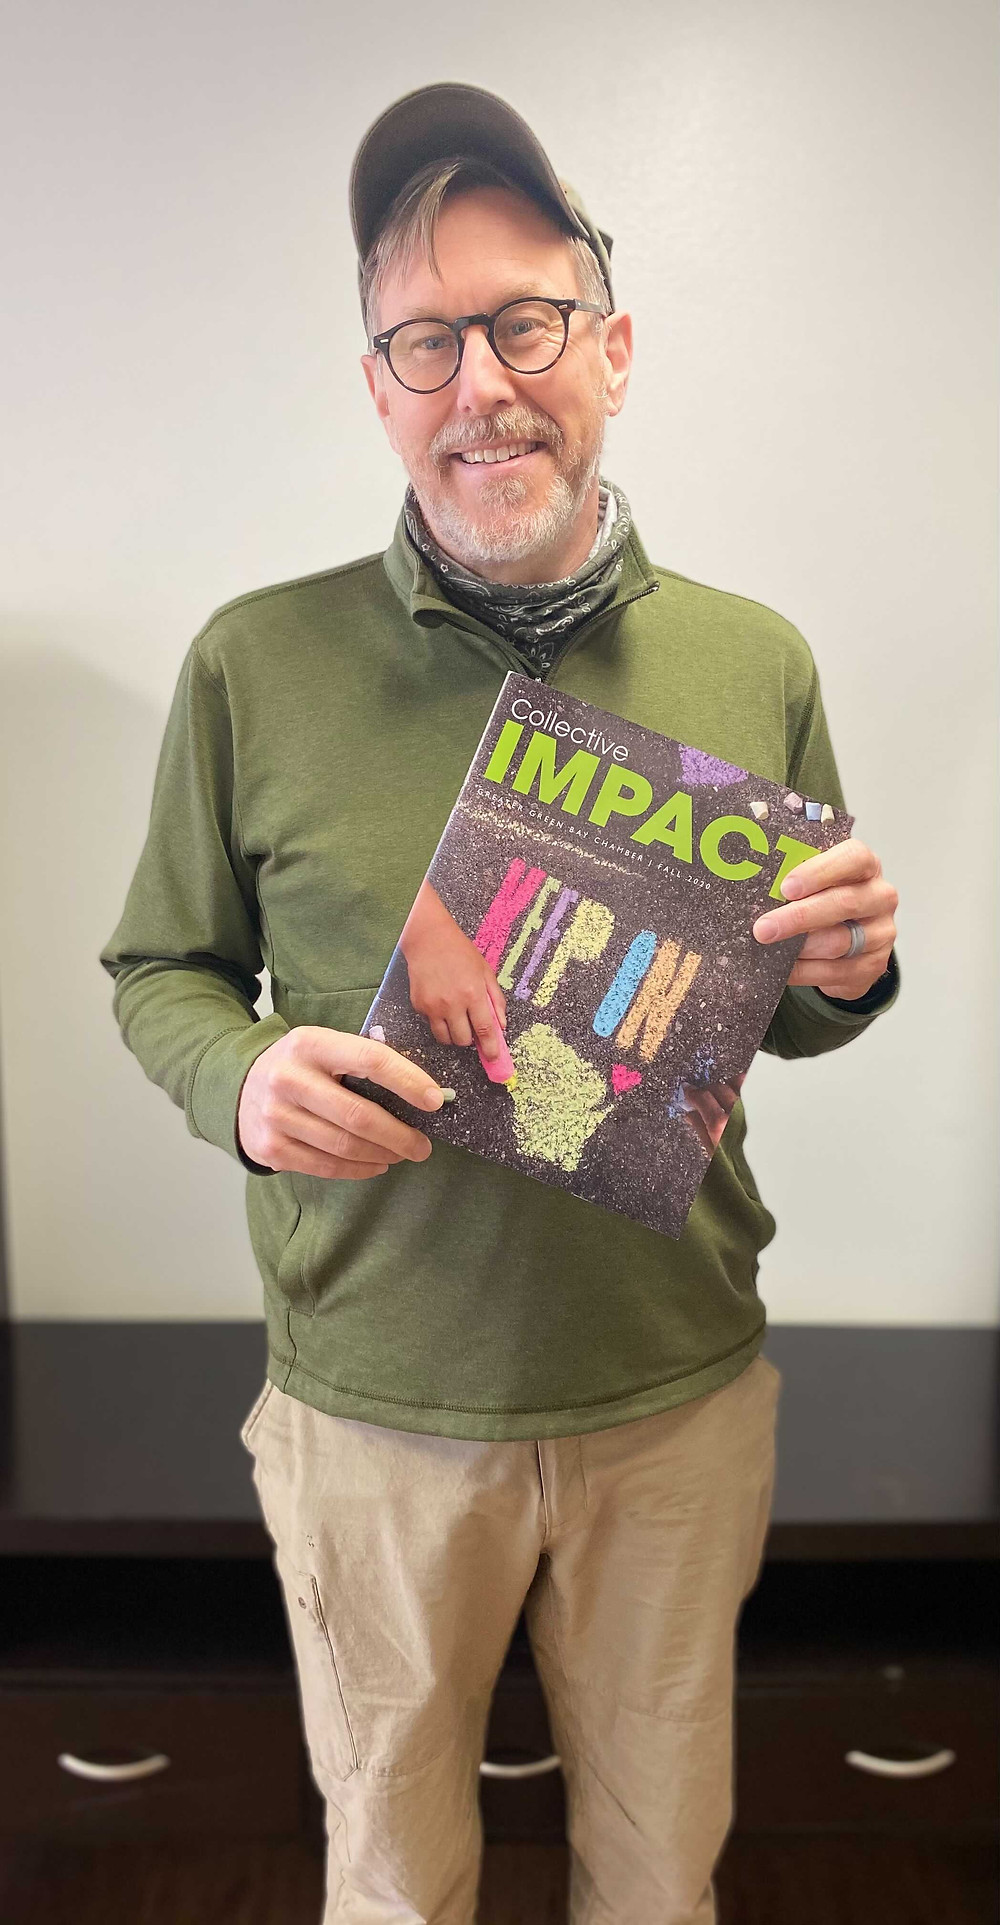 Joseph Beausoleil, President of Gemini Plastics, Inc., holding the latest published Collective Impact 2020.